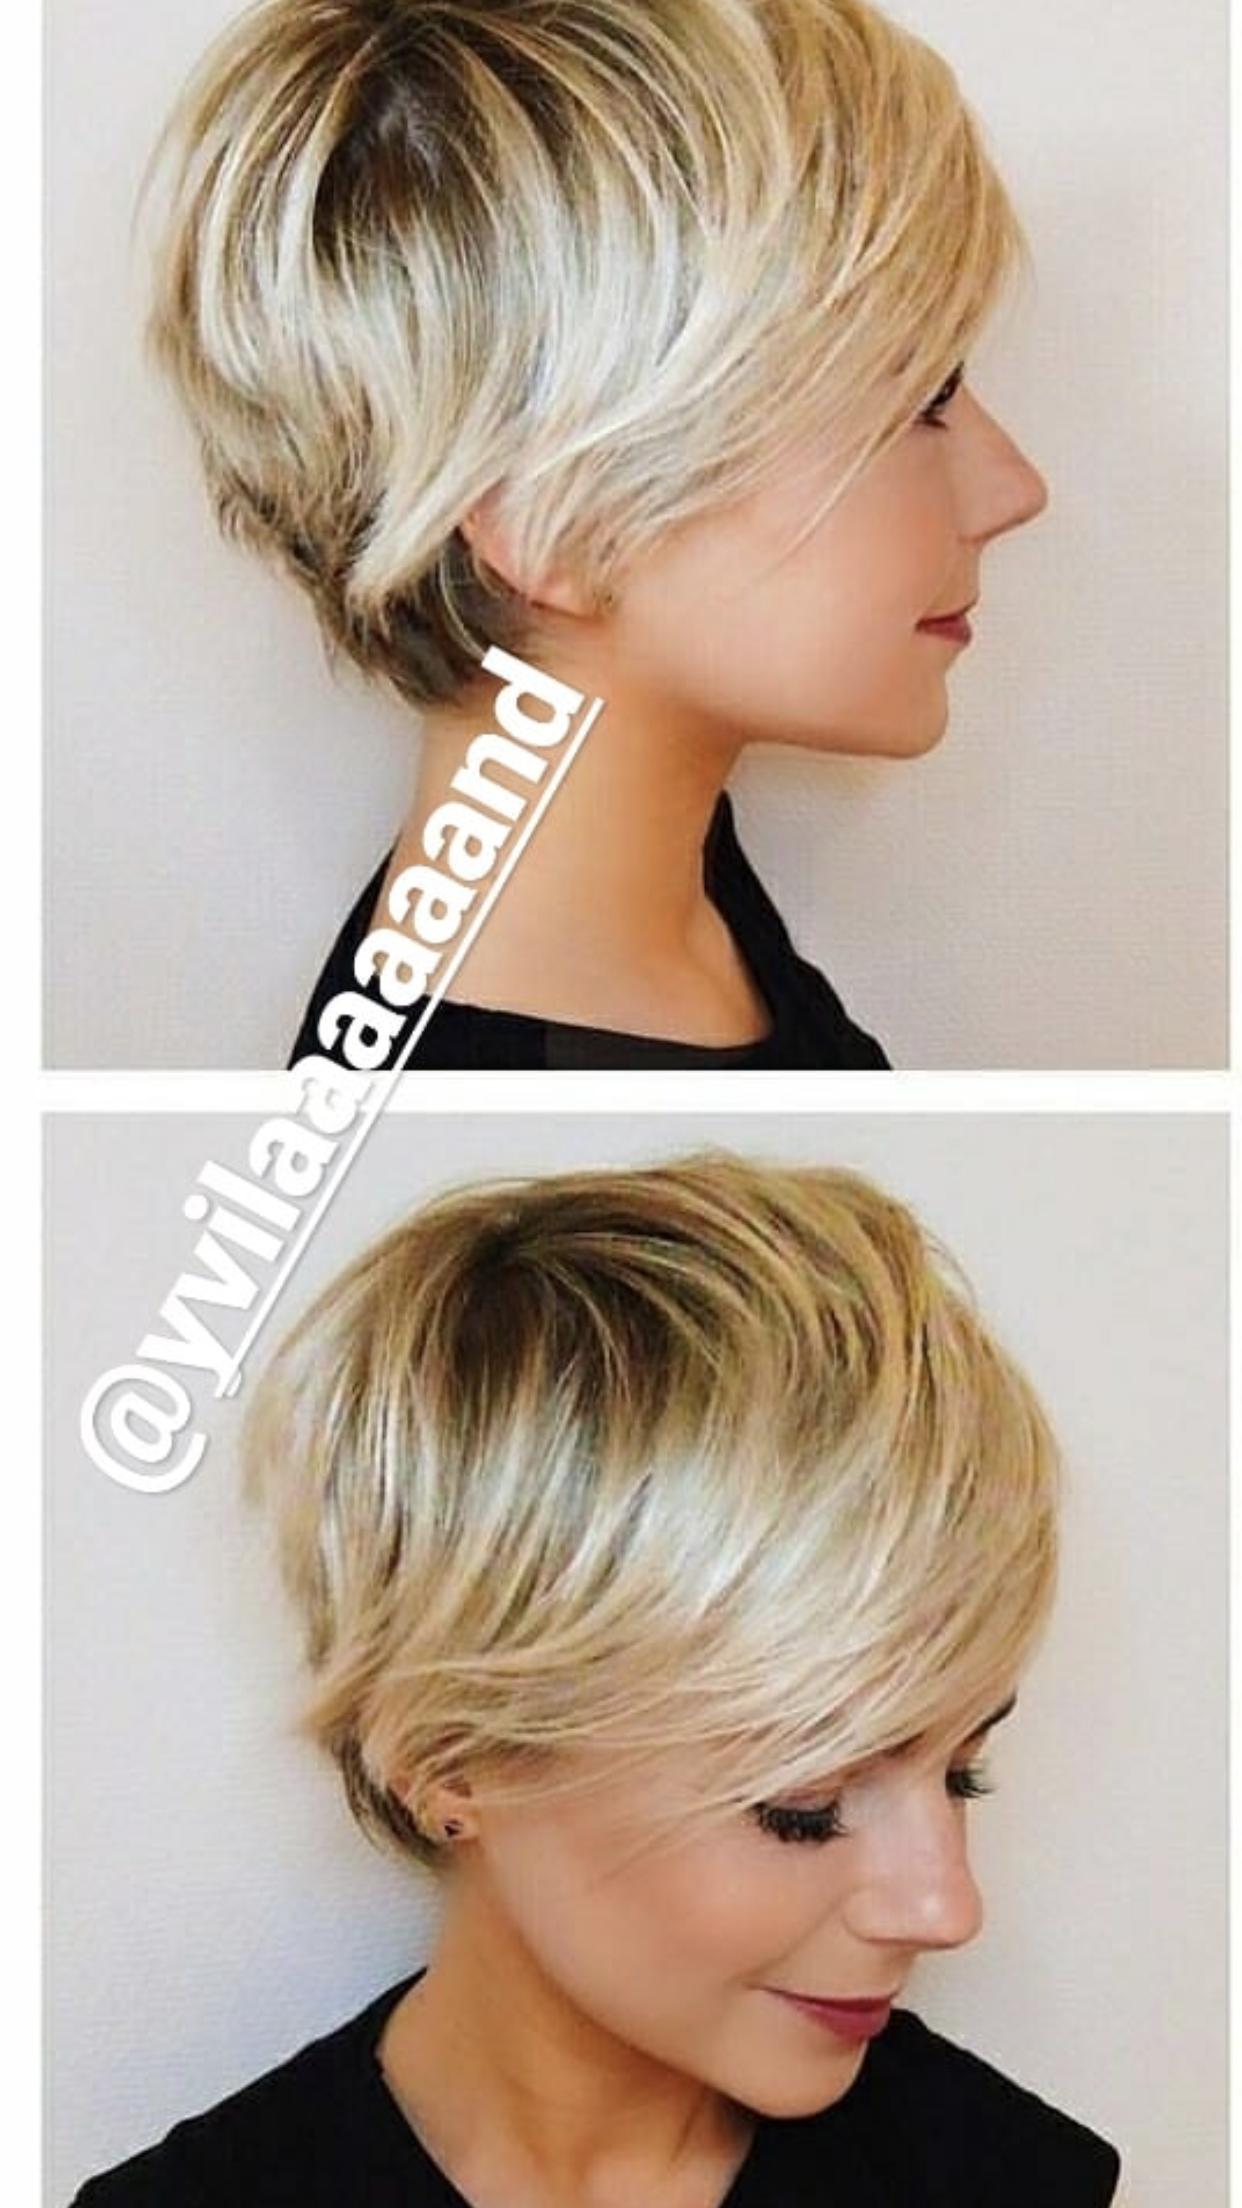 Pin by joni dyar on hair styles pinterest hair short hair